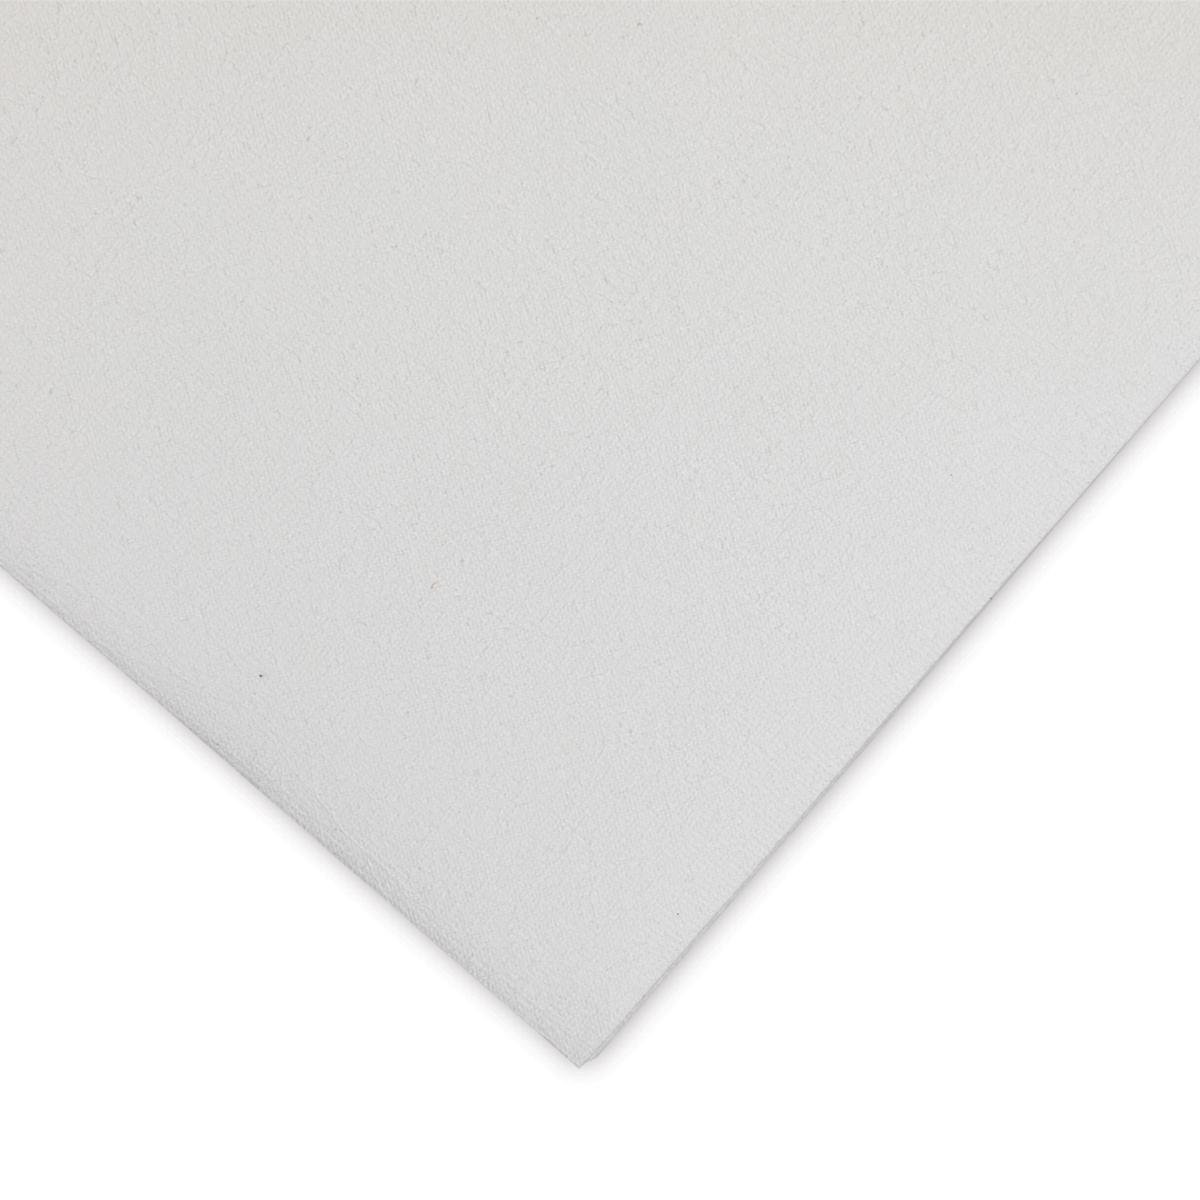 Evolon AP Paper - 8-1/2 x 11, 98 gsm, Pkg of 15 Sheets